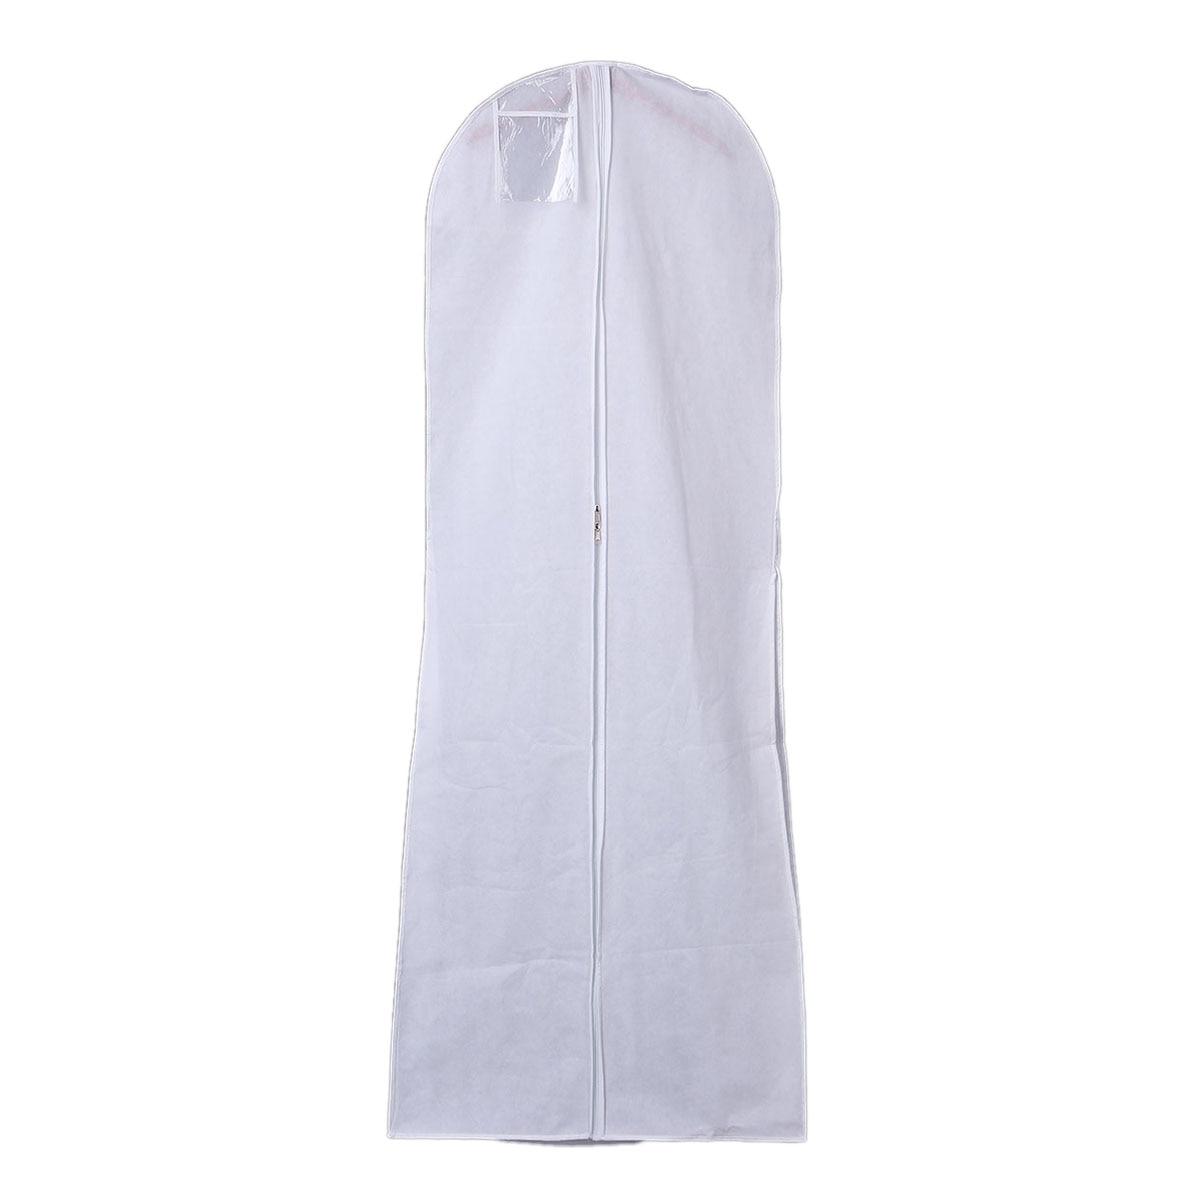 Aliexpress.com : Buy Hanging Wedding Dress Bridal Gown